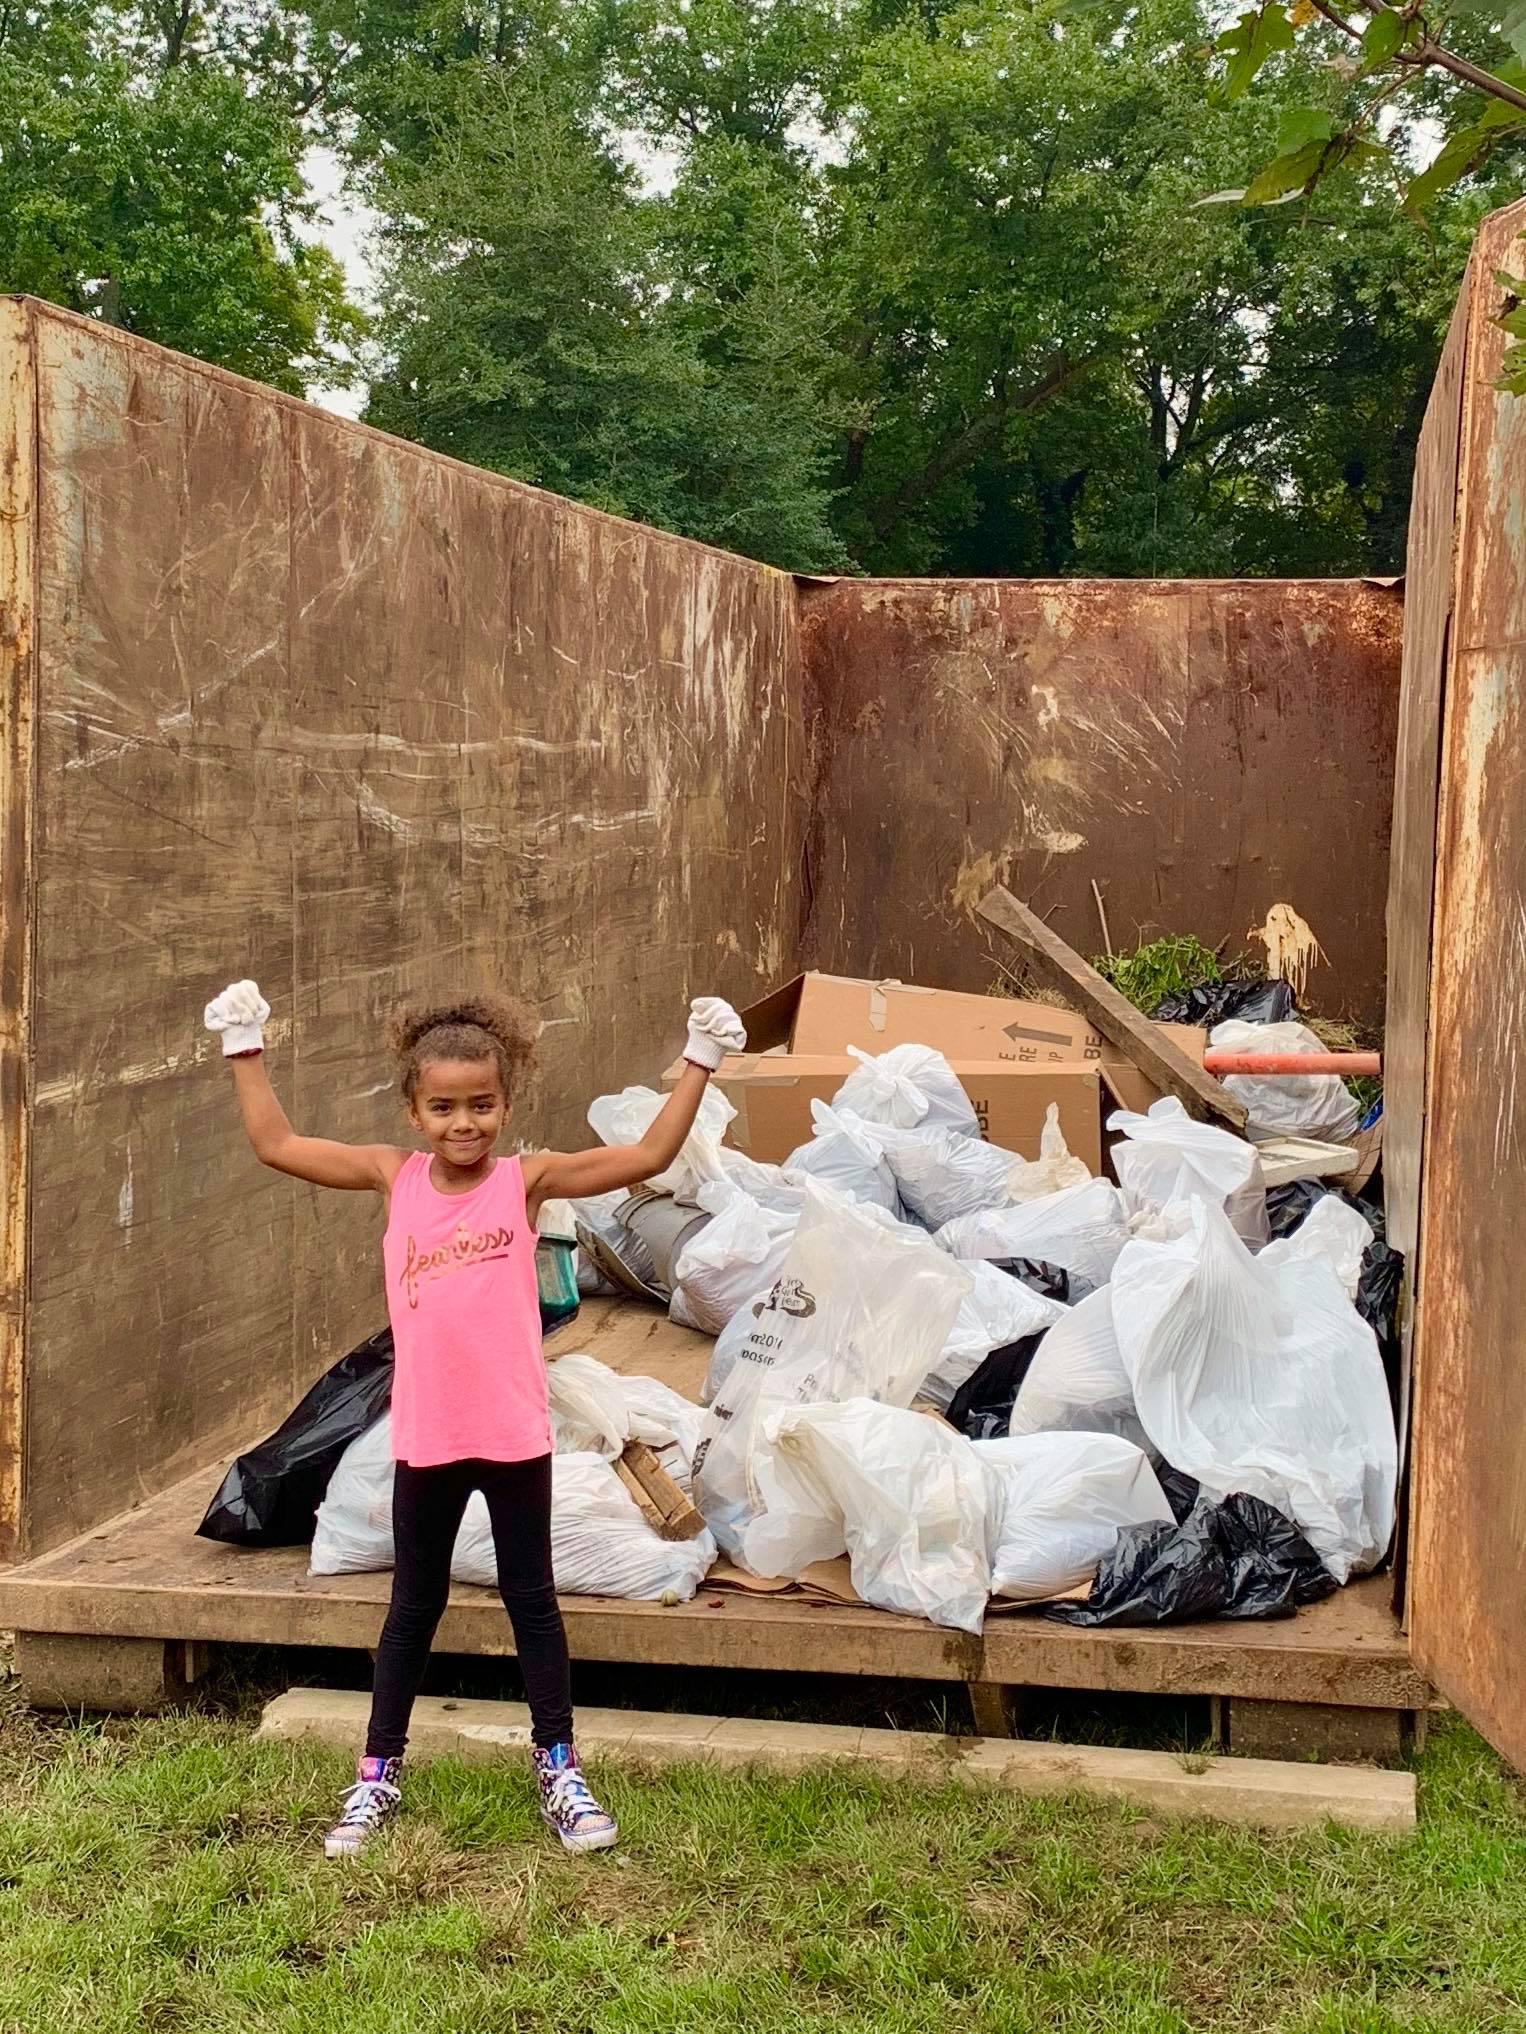 Johanna Bergenholtz | Rappahannock River | Friends of the Rappahannock's Big Fall Cleanup 2018